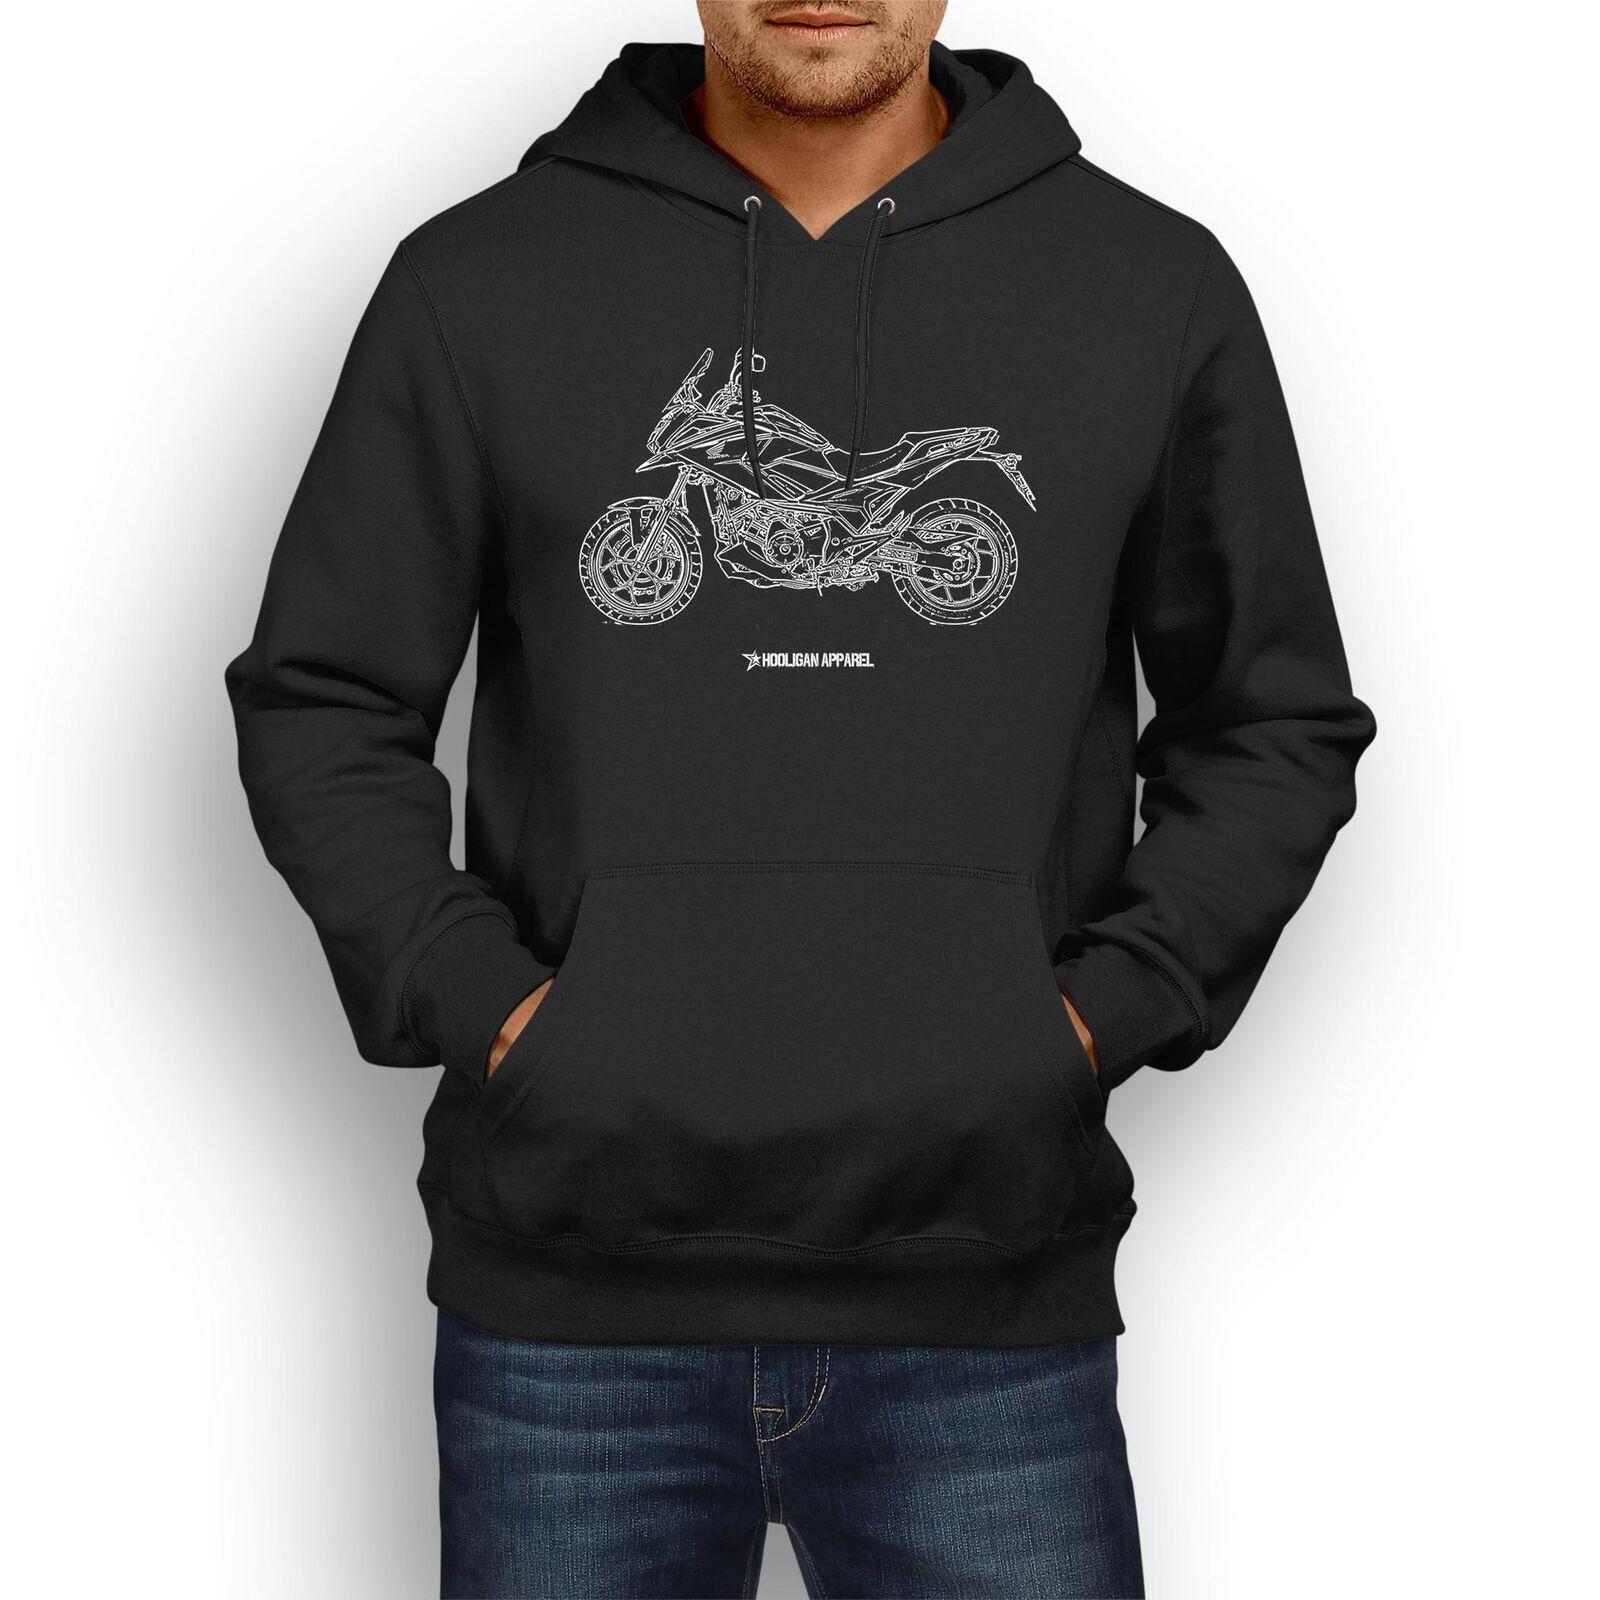 Honda NC750X DCT ABS 2016 InspiROT Motorcycle Art Men's Hoodie